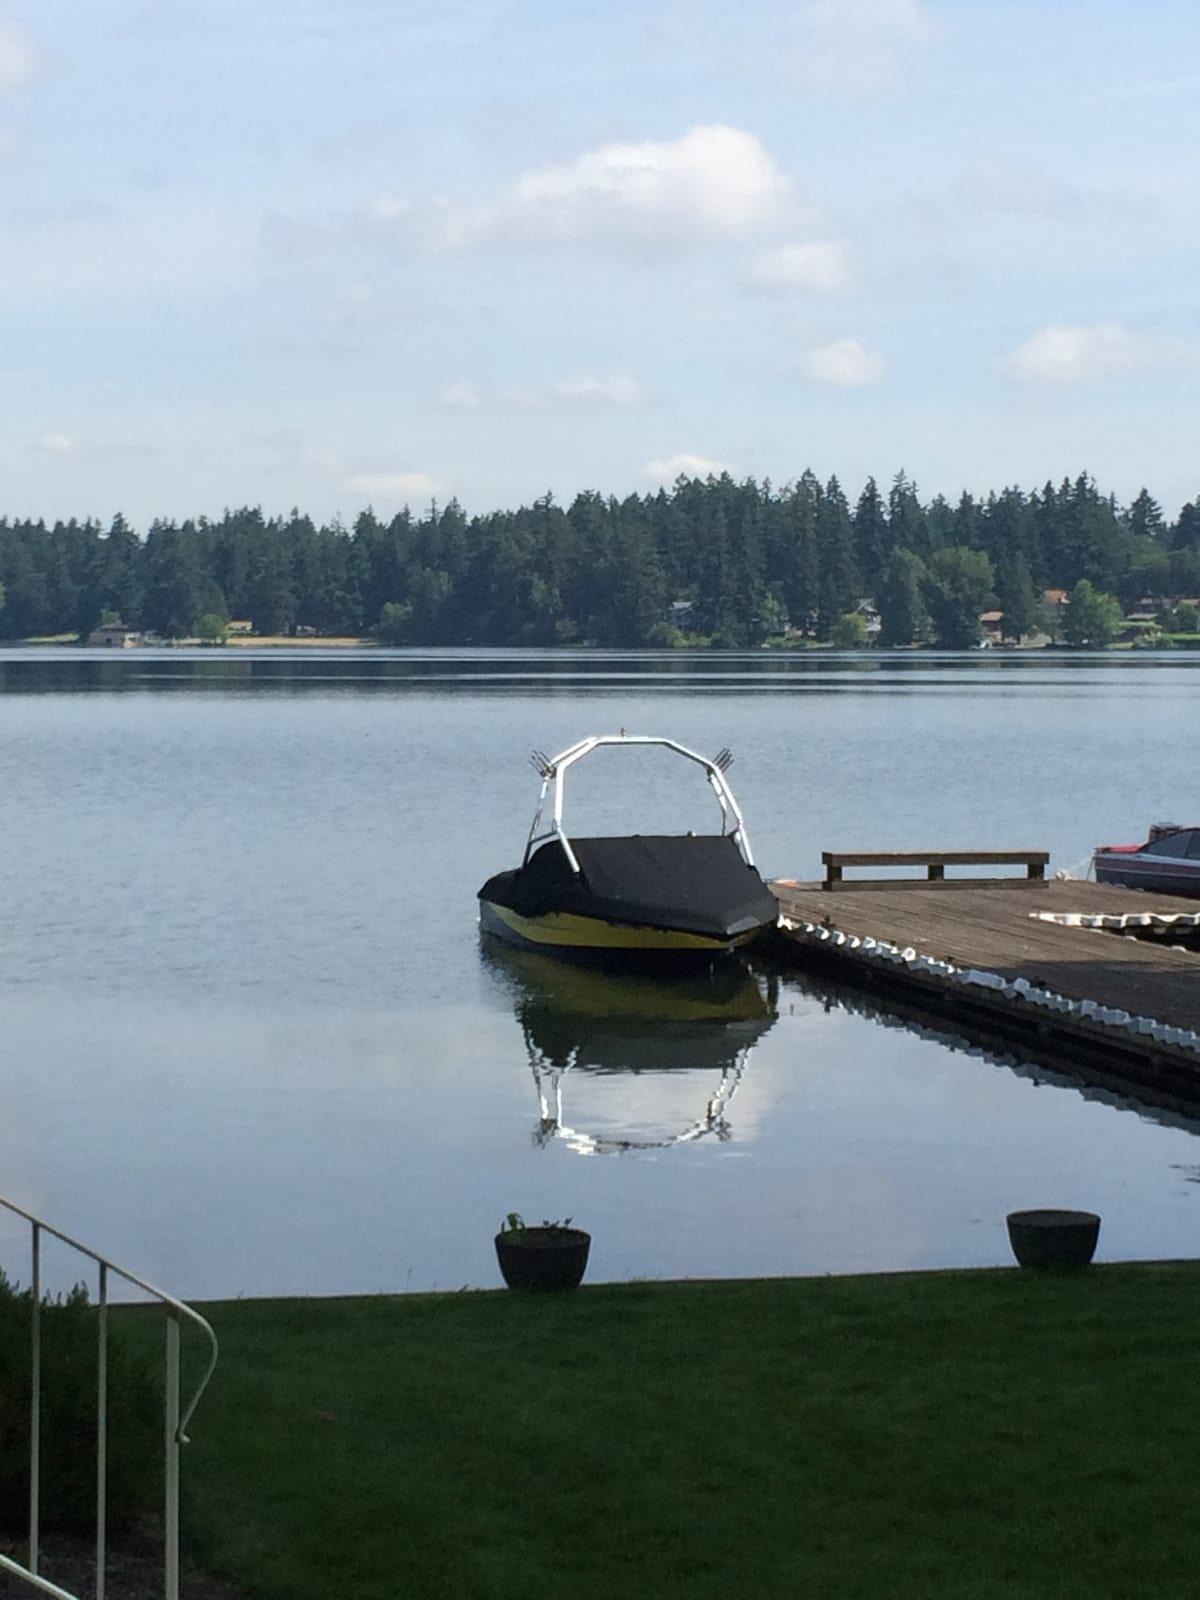 Lakefront condo on Spanaway Lake